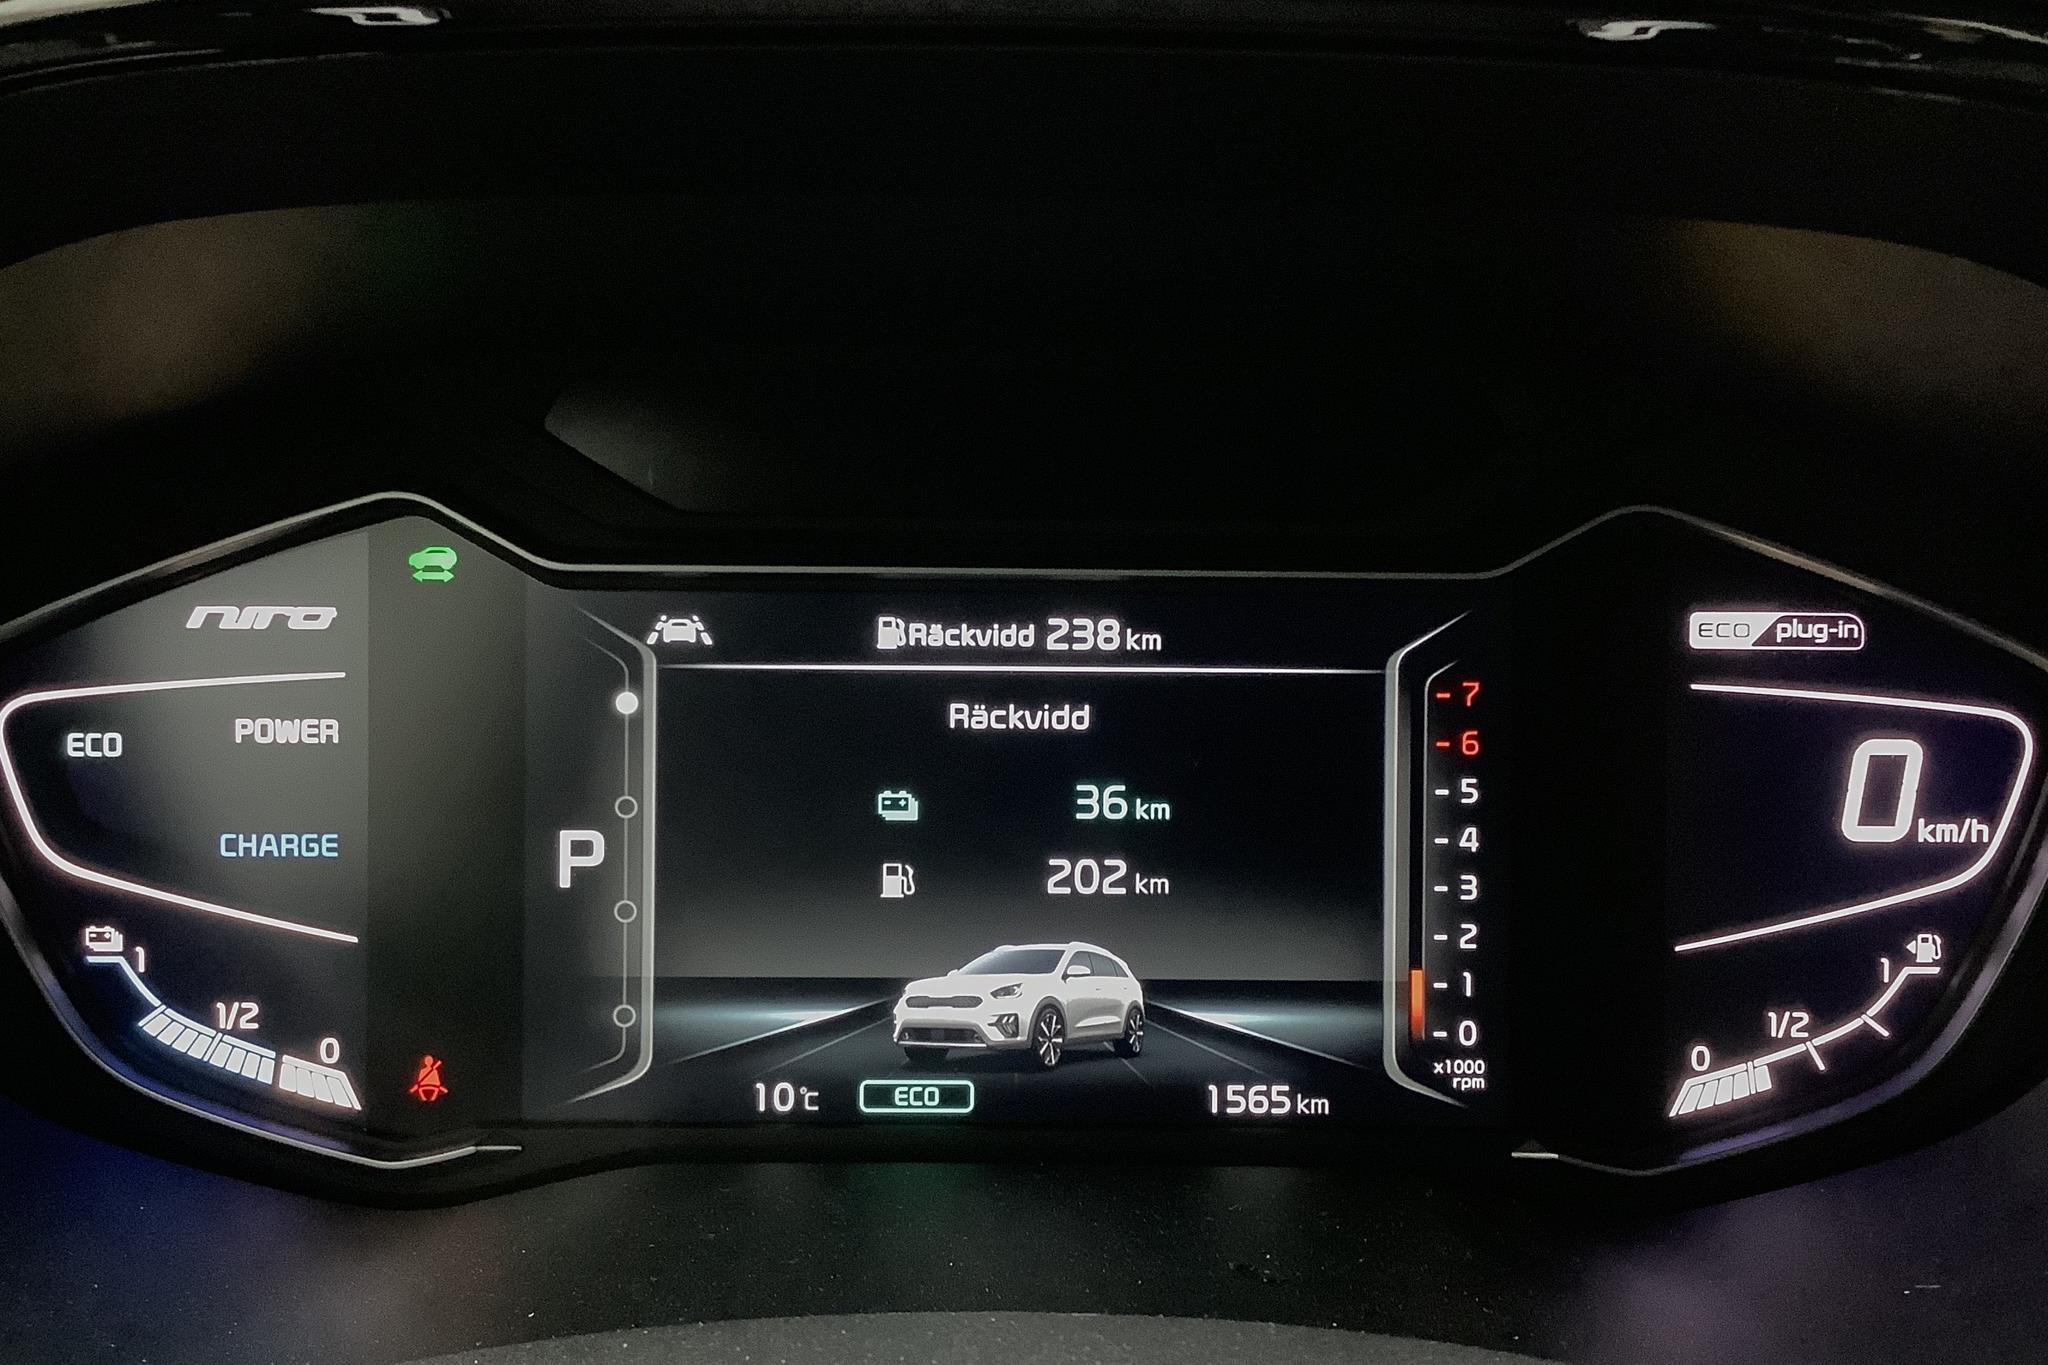 KIA Niro Plug-in Hybrid 1.6 LCI (141hk) - 1 560 km - Automatic - black - 2020